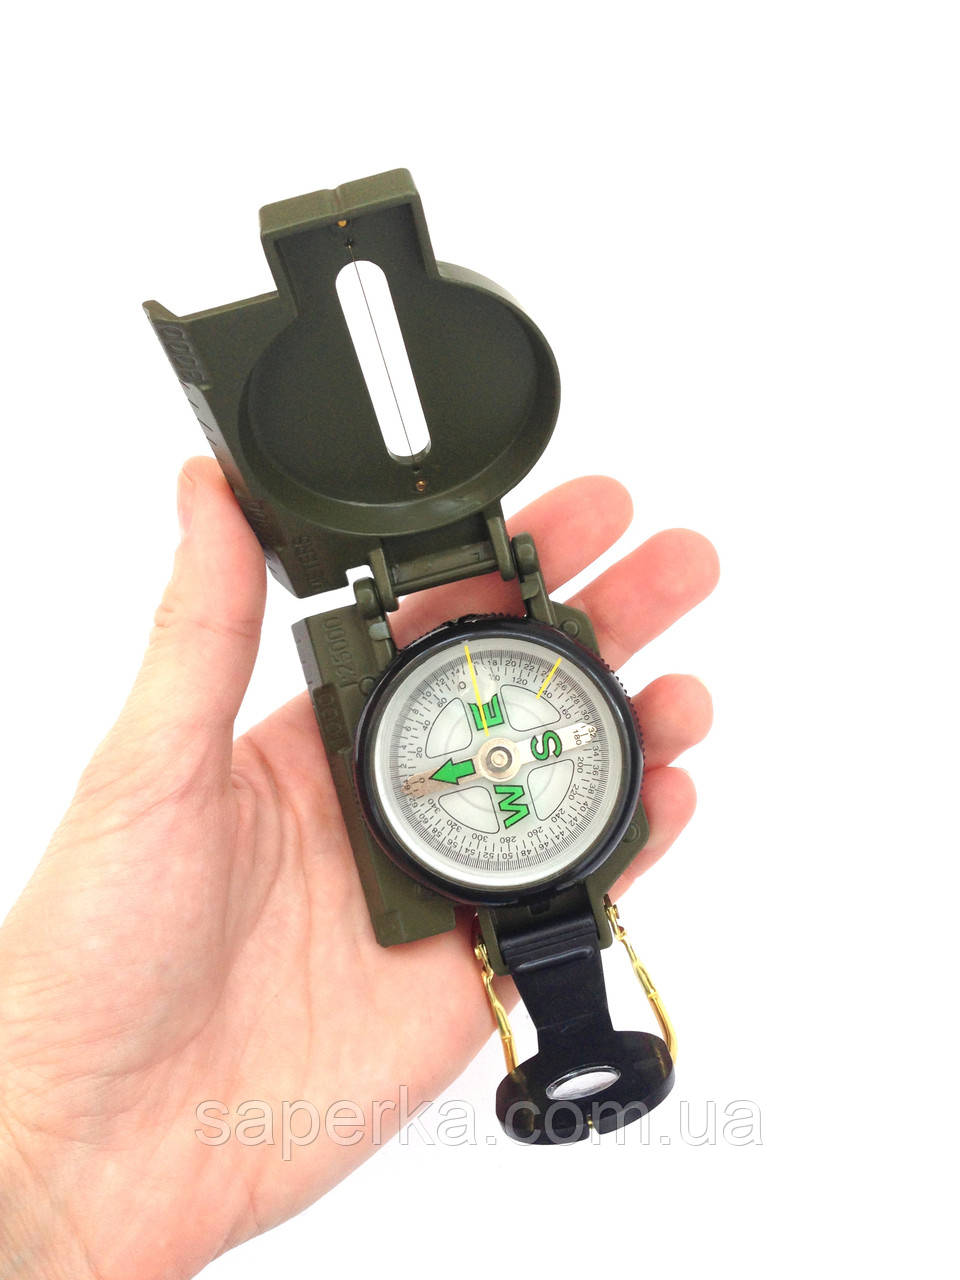 Армейский компас Lensatic США (пластик, олива)